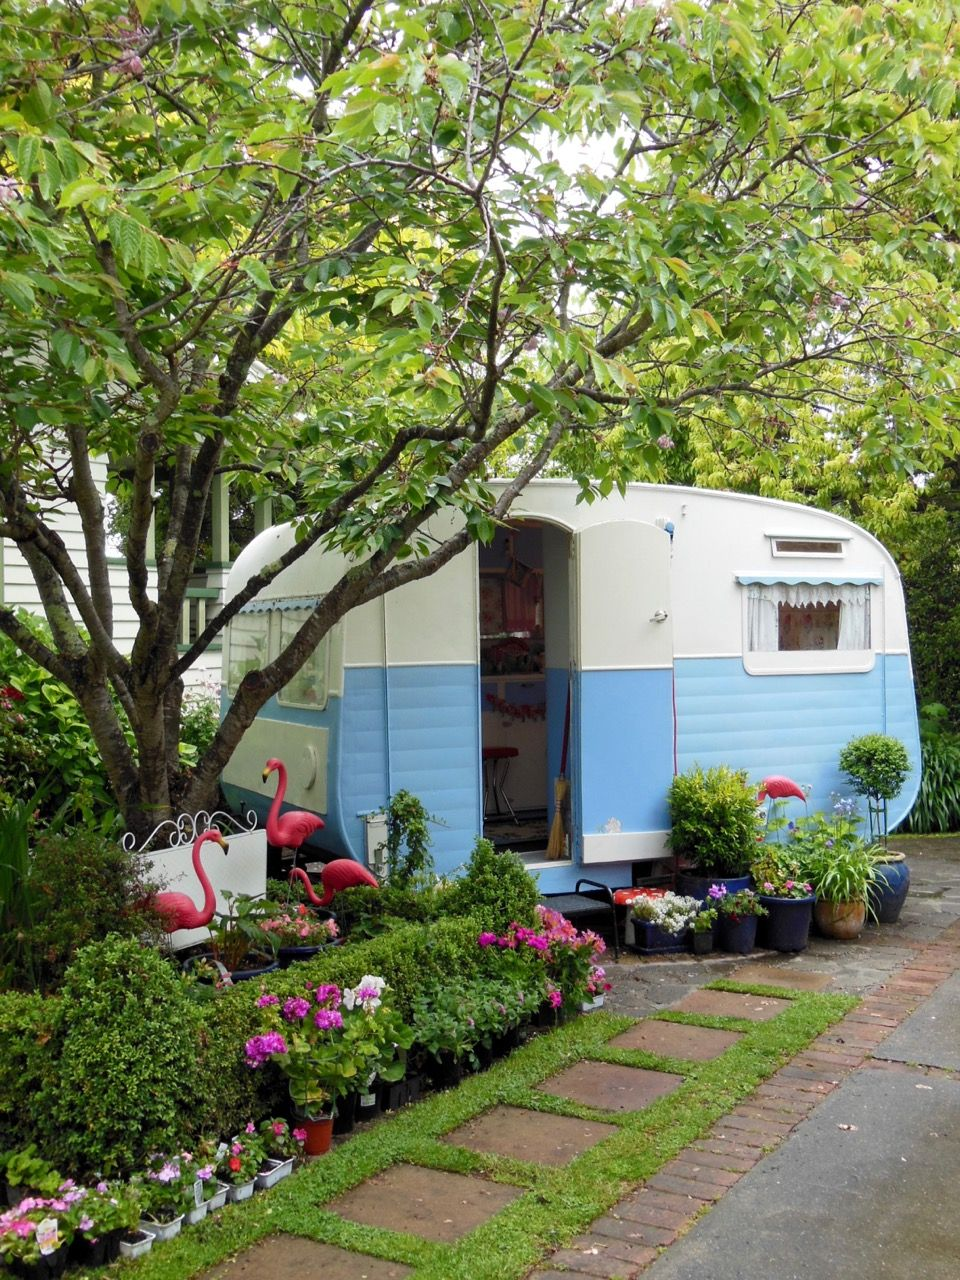 sweet little backyard tiny trailer tiny house retro caravan